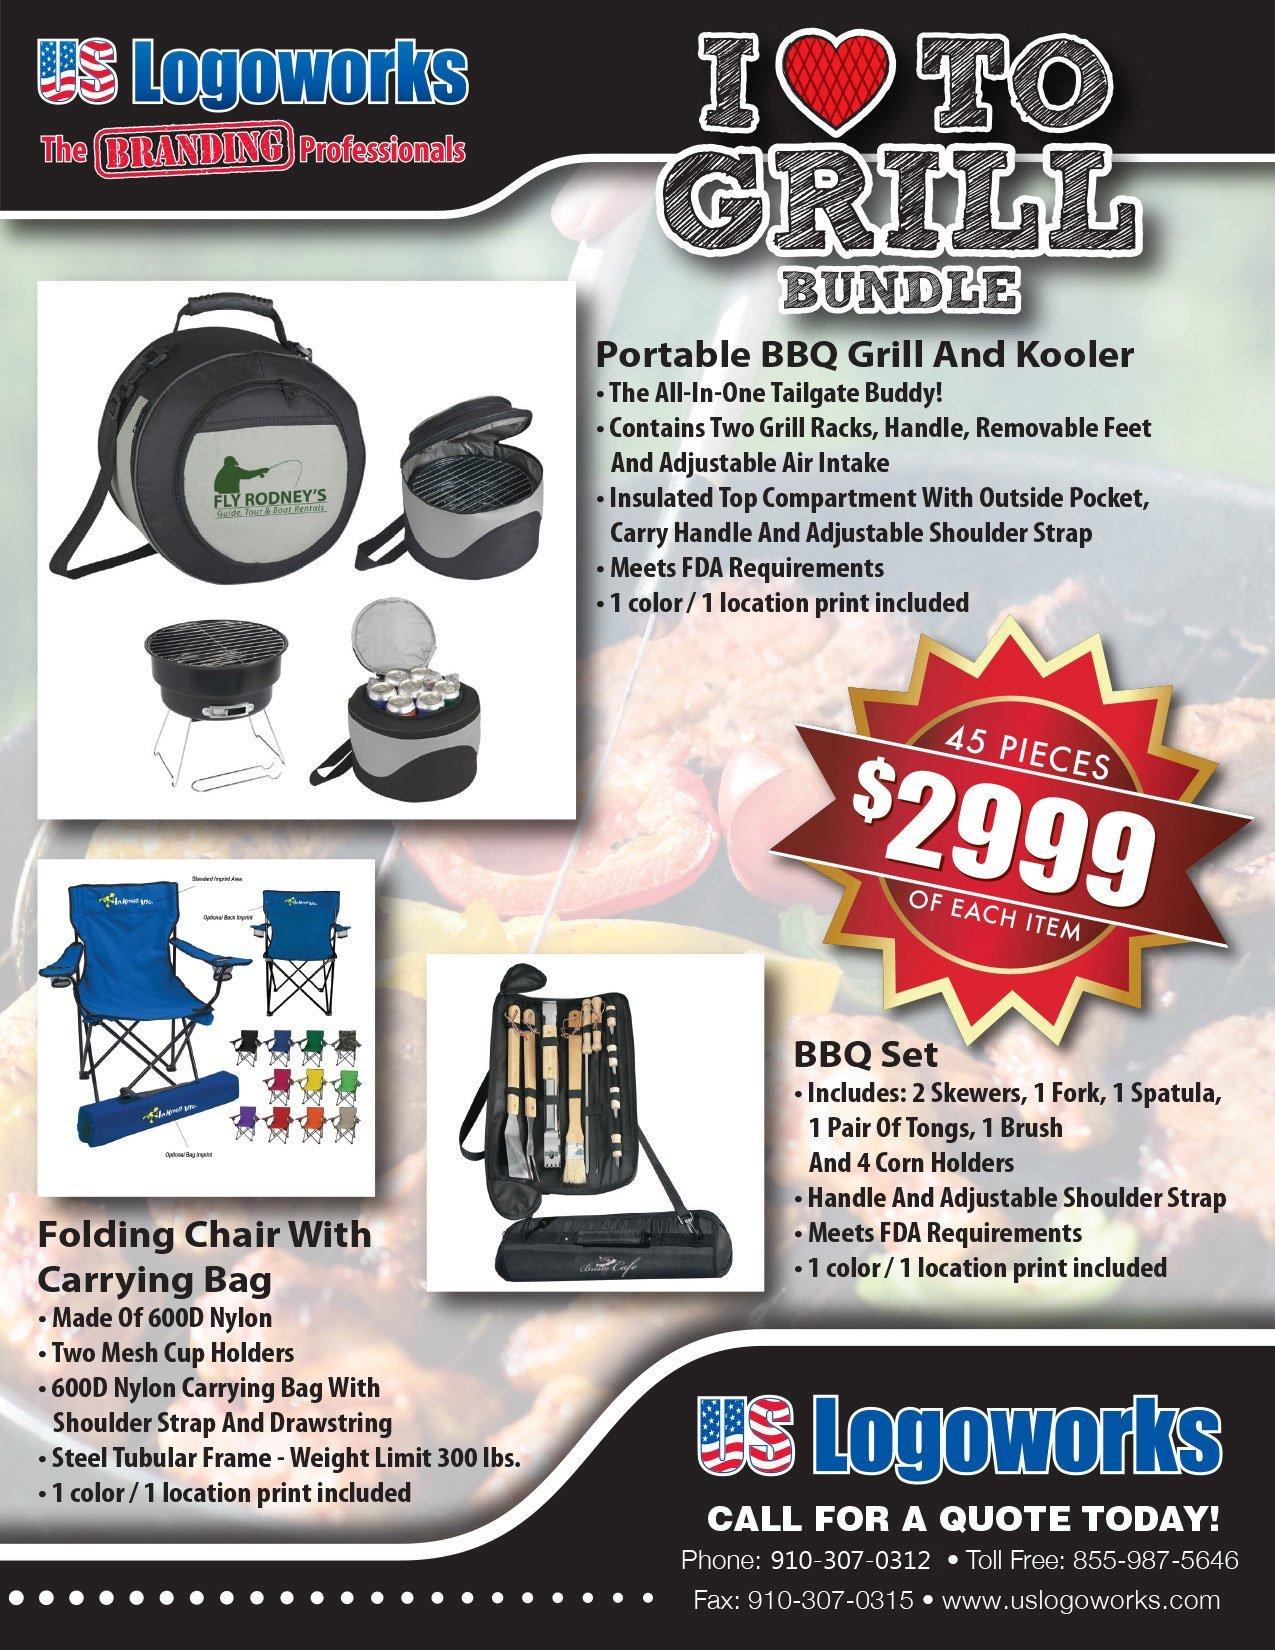 Promotional Products Manassas, VA & Fayetteville, NC